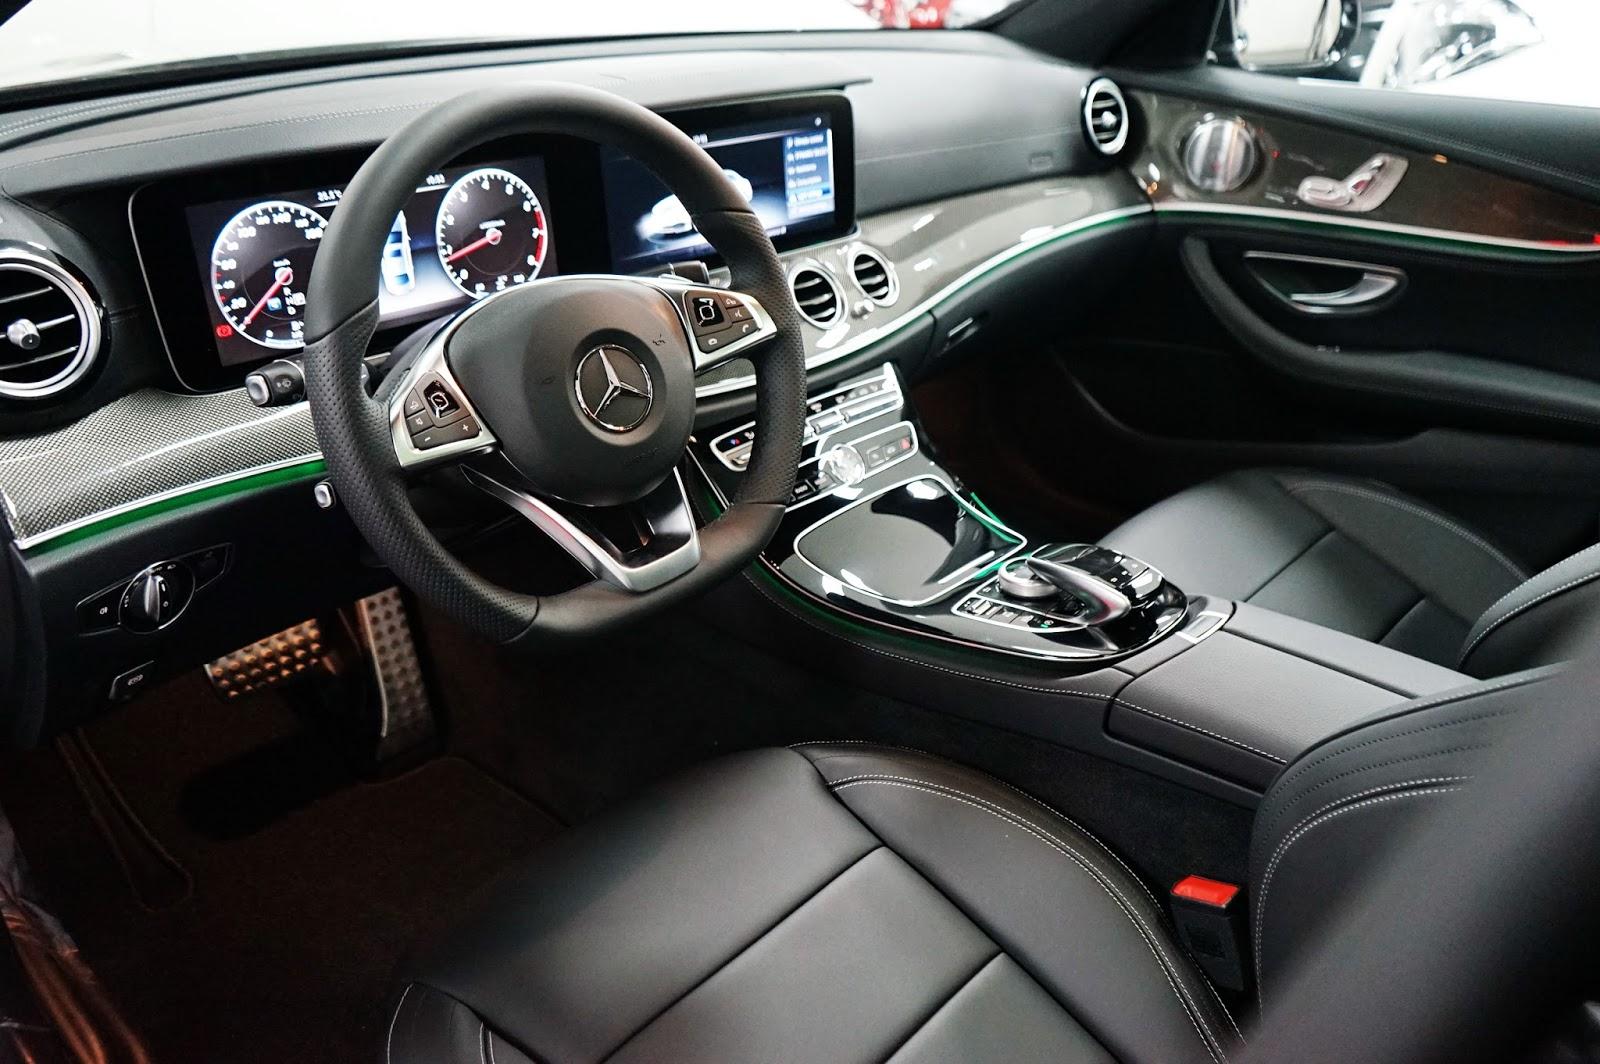 xe Mercedes Benz E400 thế hệ mới 06